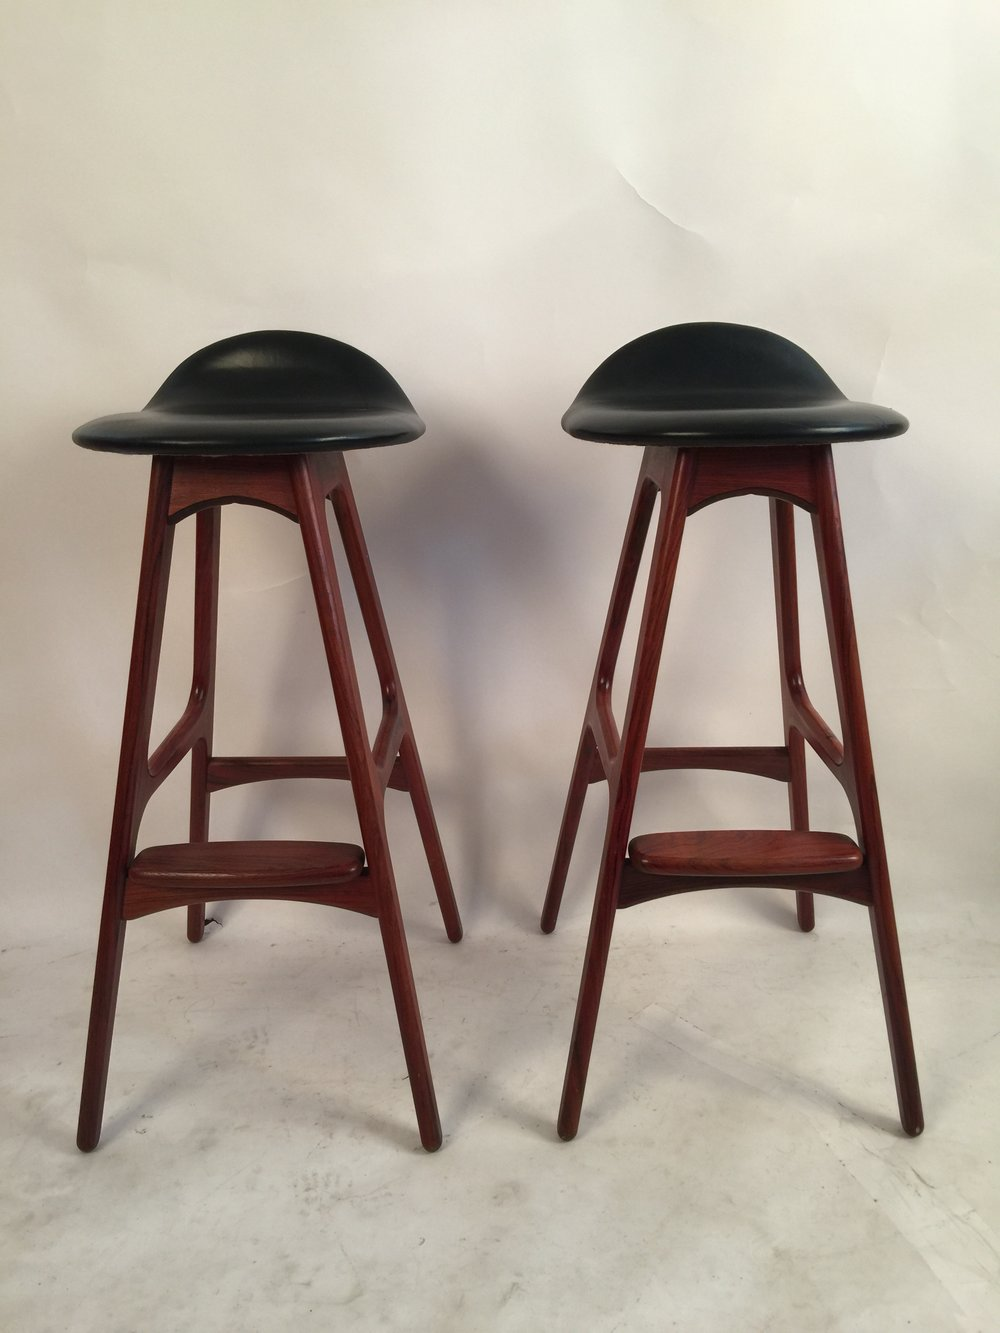 Erik Buck model OD61 bar stools